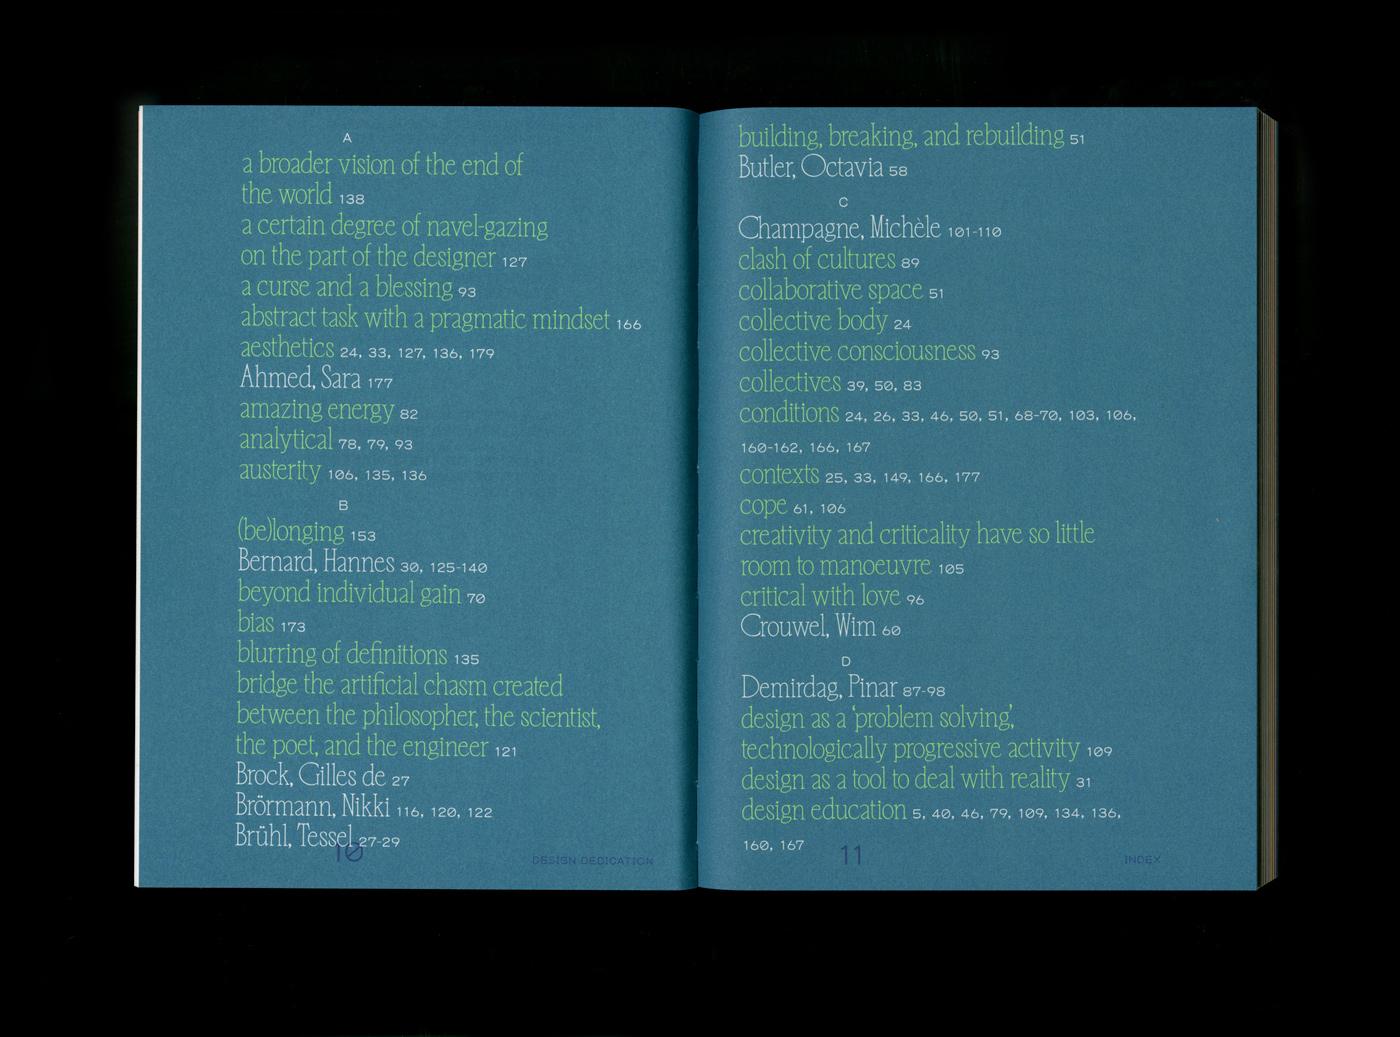 20 collide24 Tessa Meeus Alex Walker Design Dedication - Tessa Meeus and Alex Walker talk us through the creative process behind the book 'Design Dedication', edited by Annelys de Vet and published by Valiz